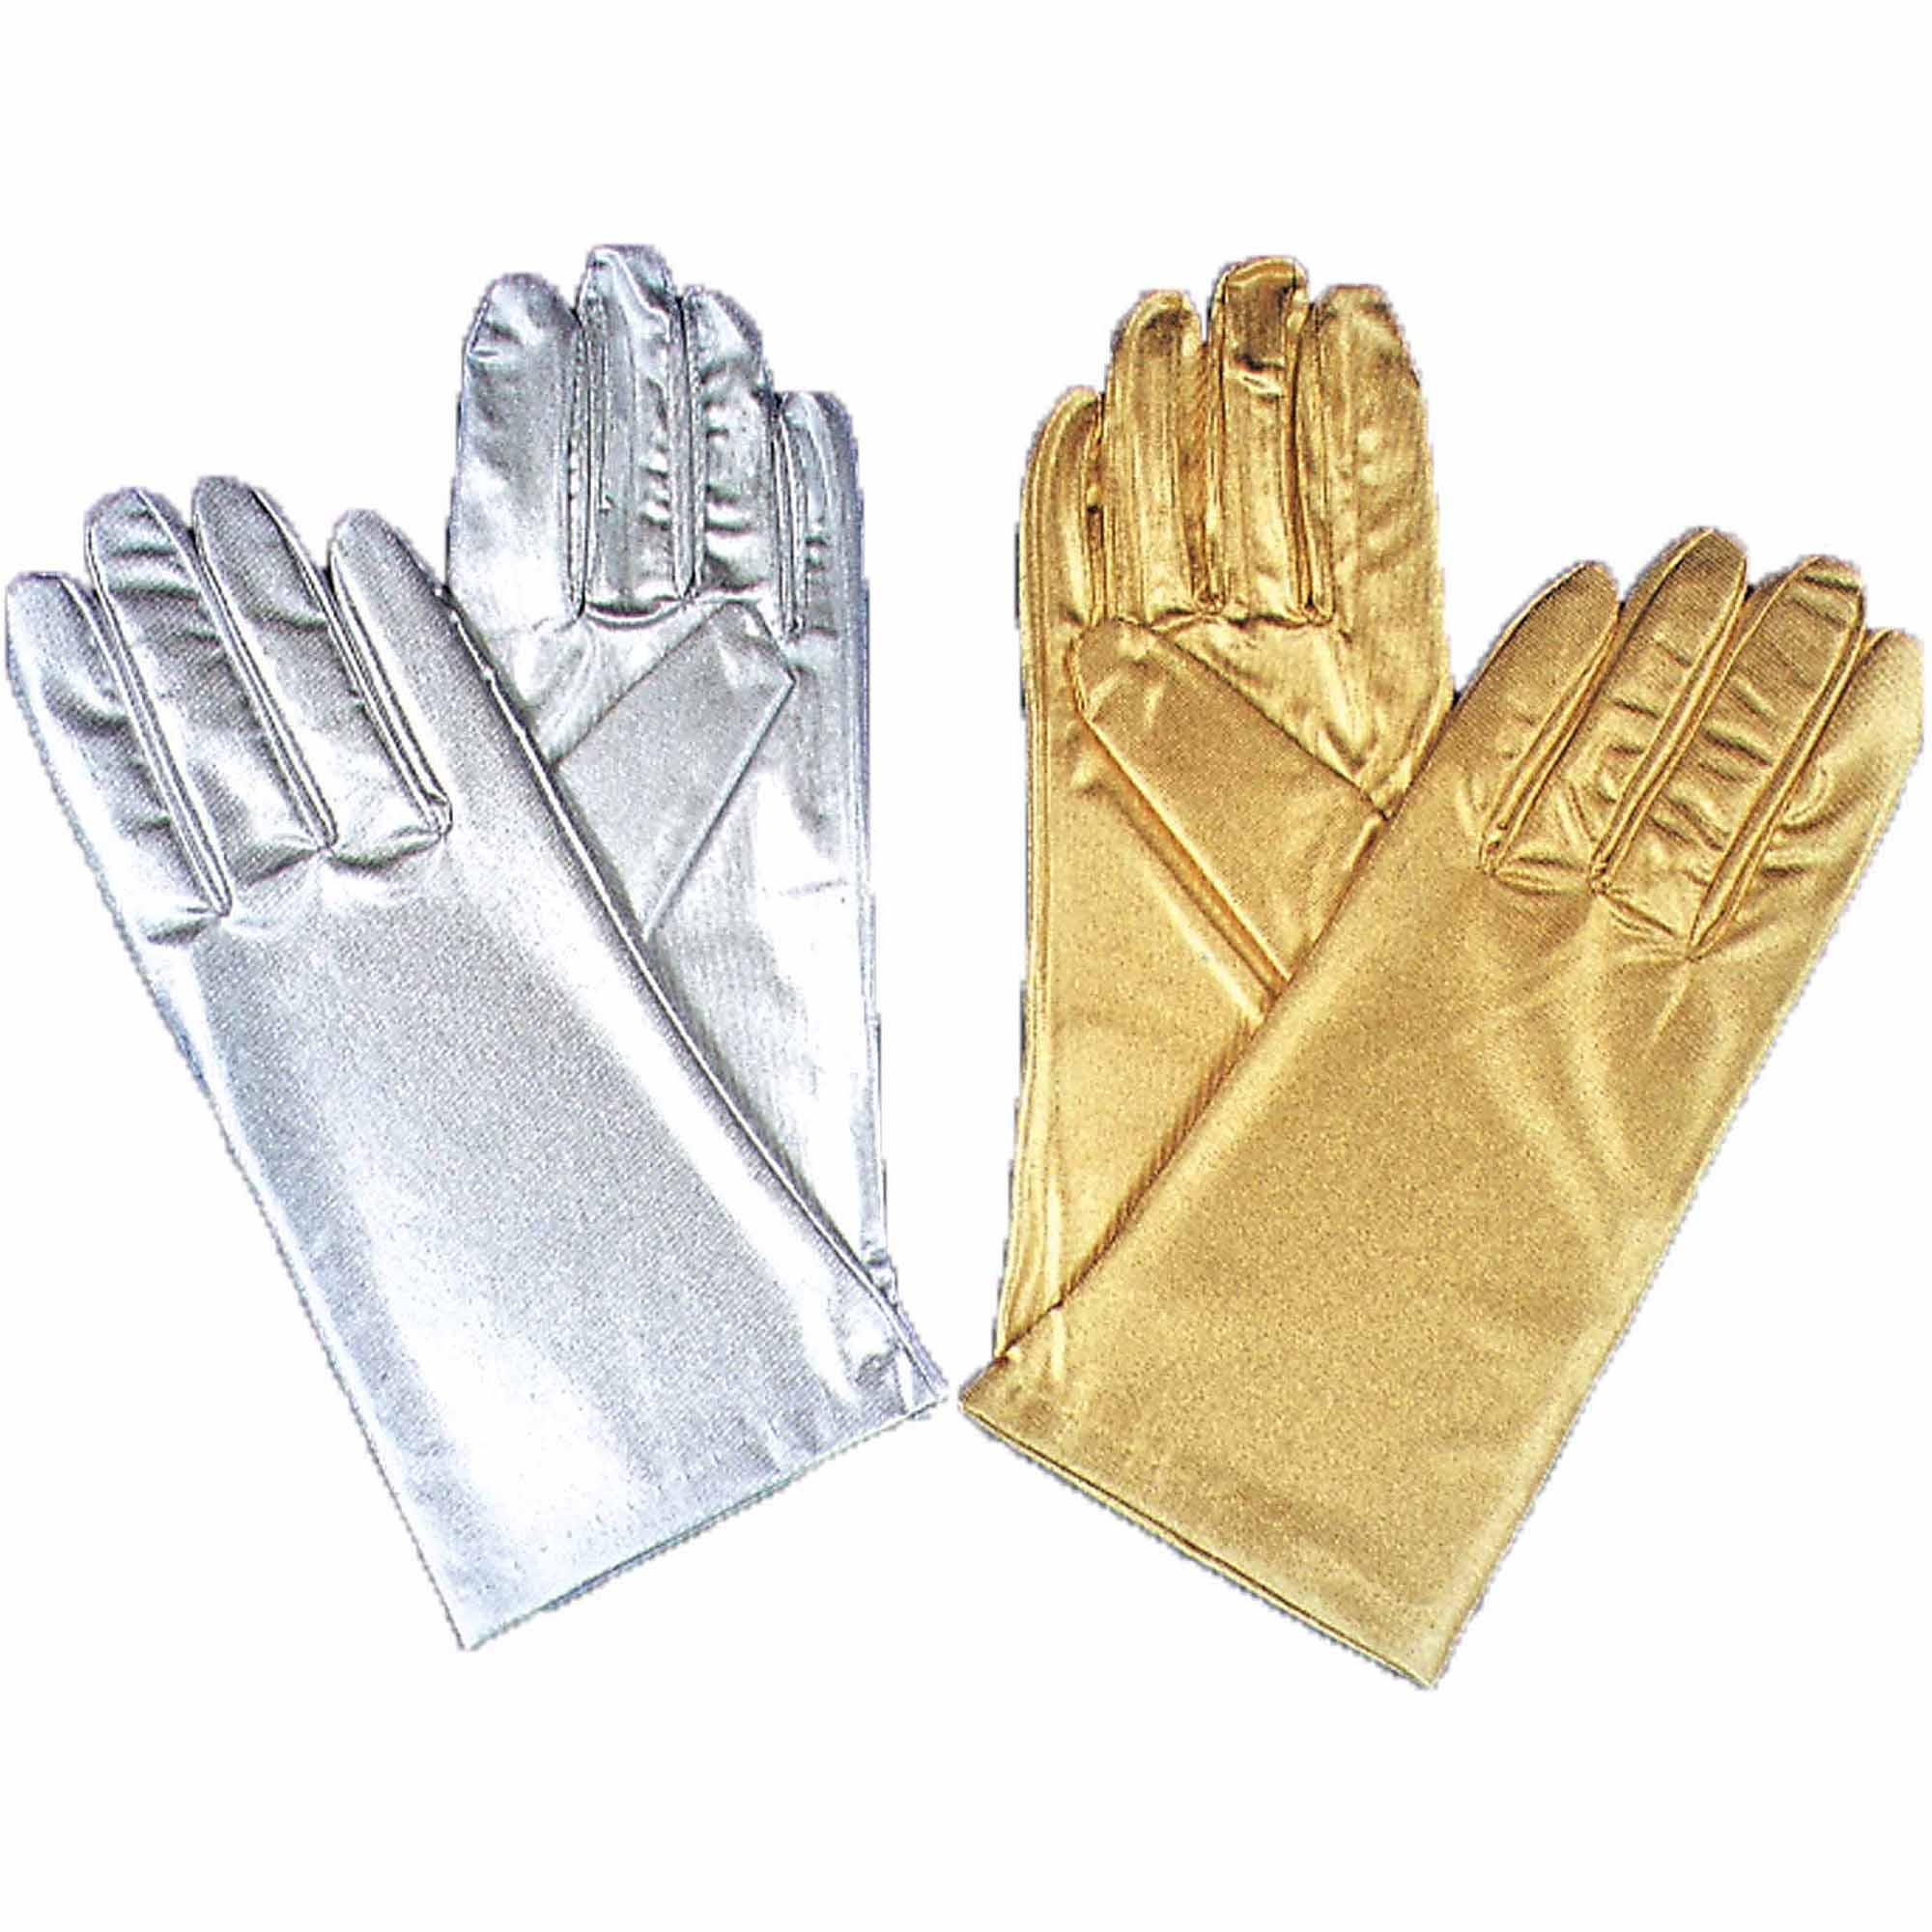 Metallic Gloves Adult Halloween Accessory